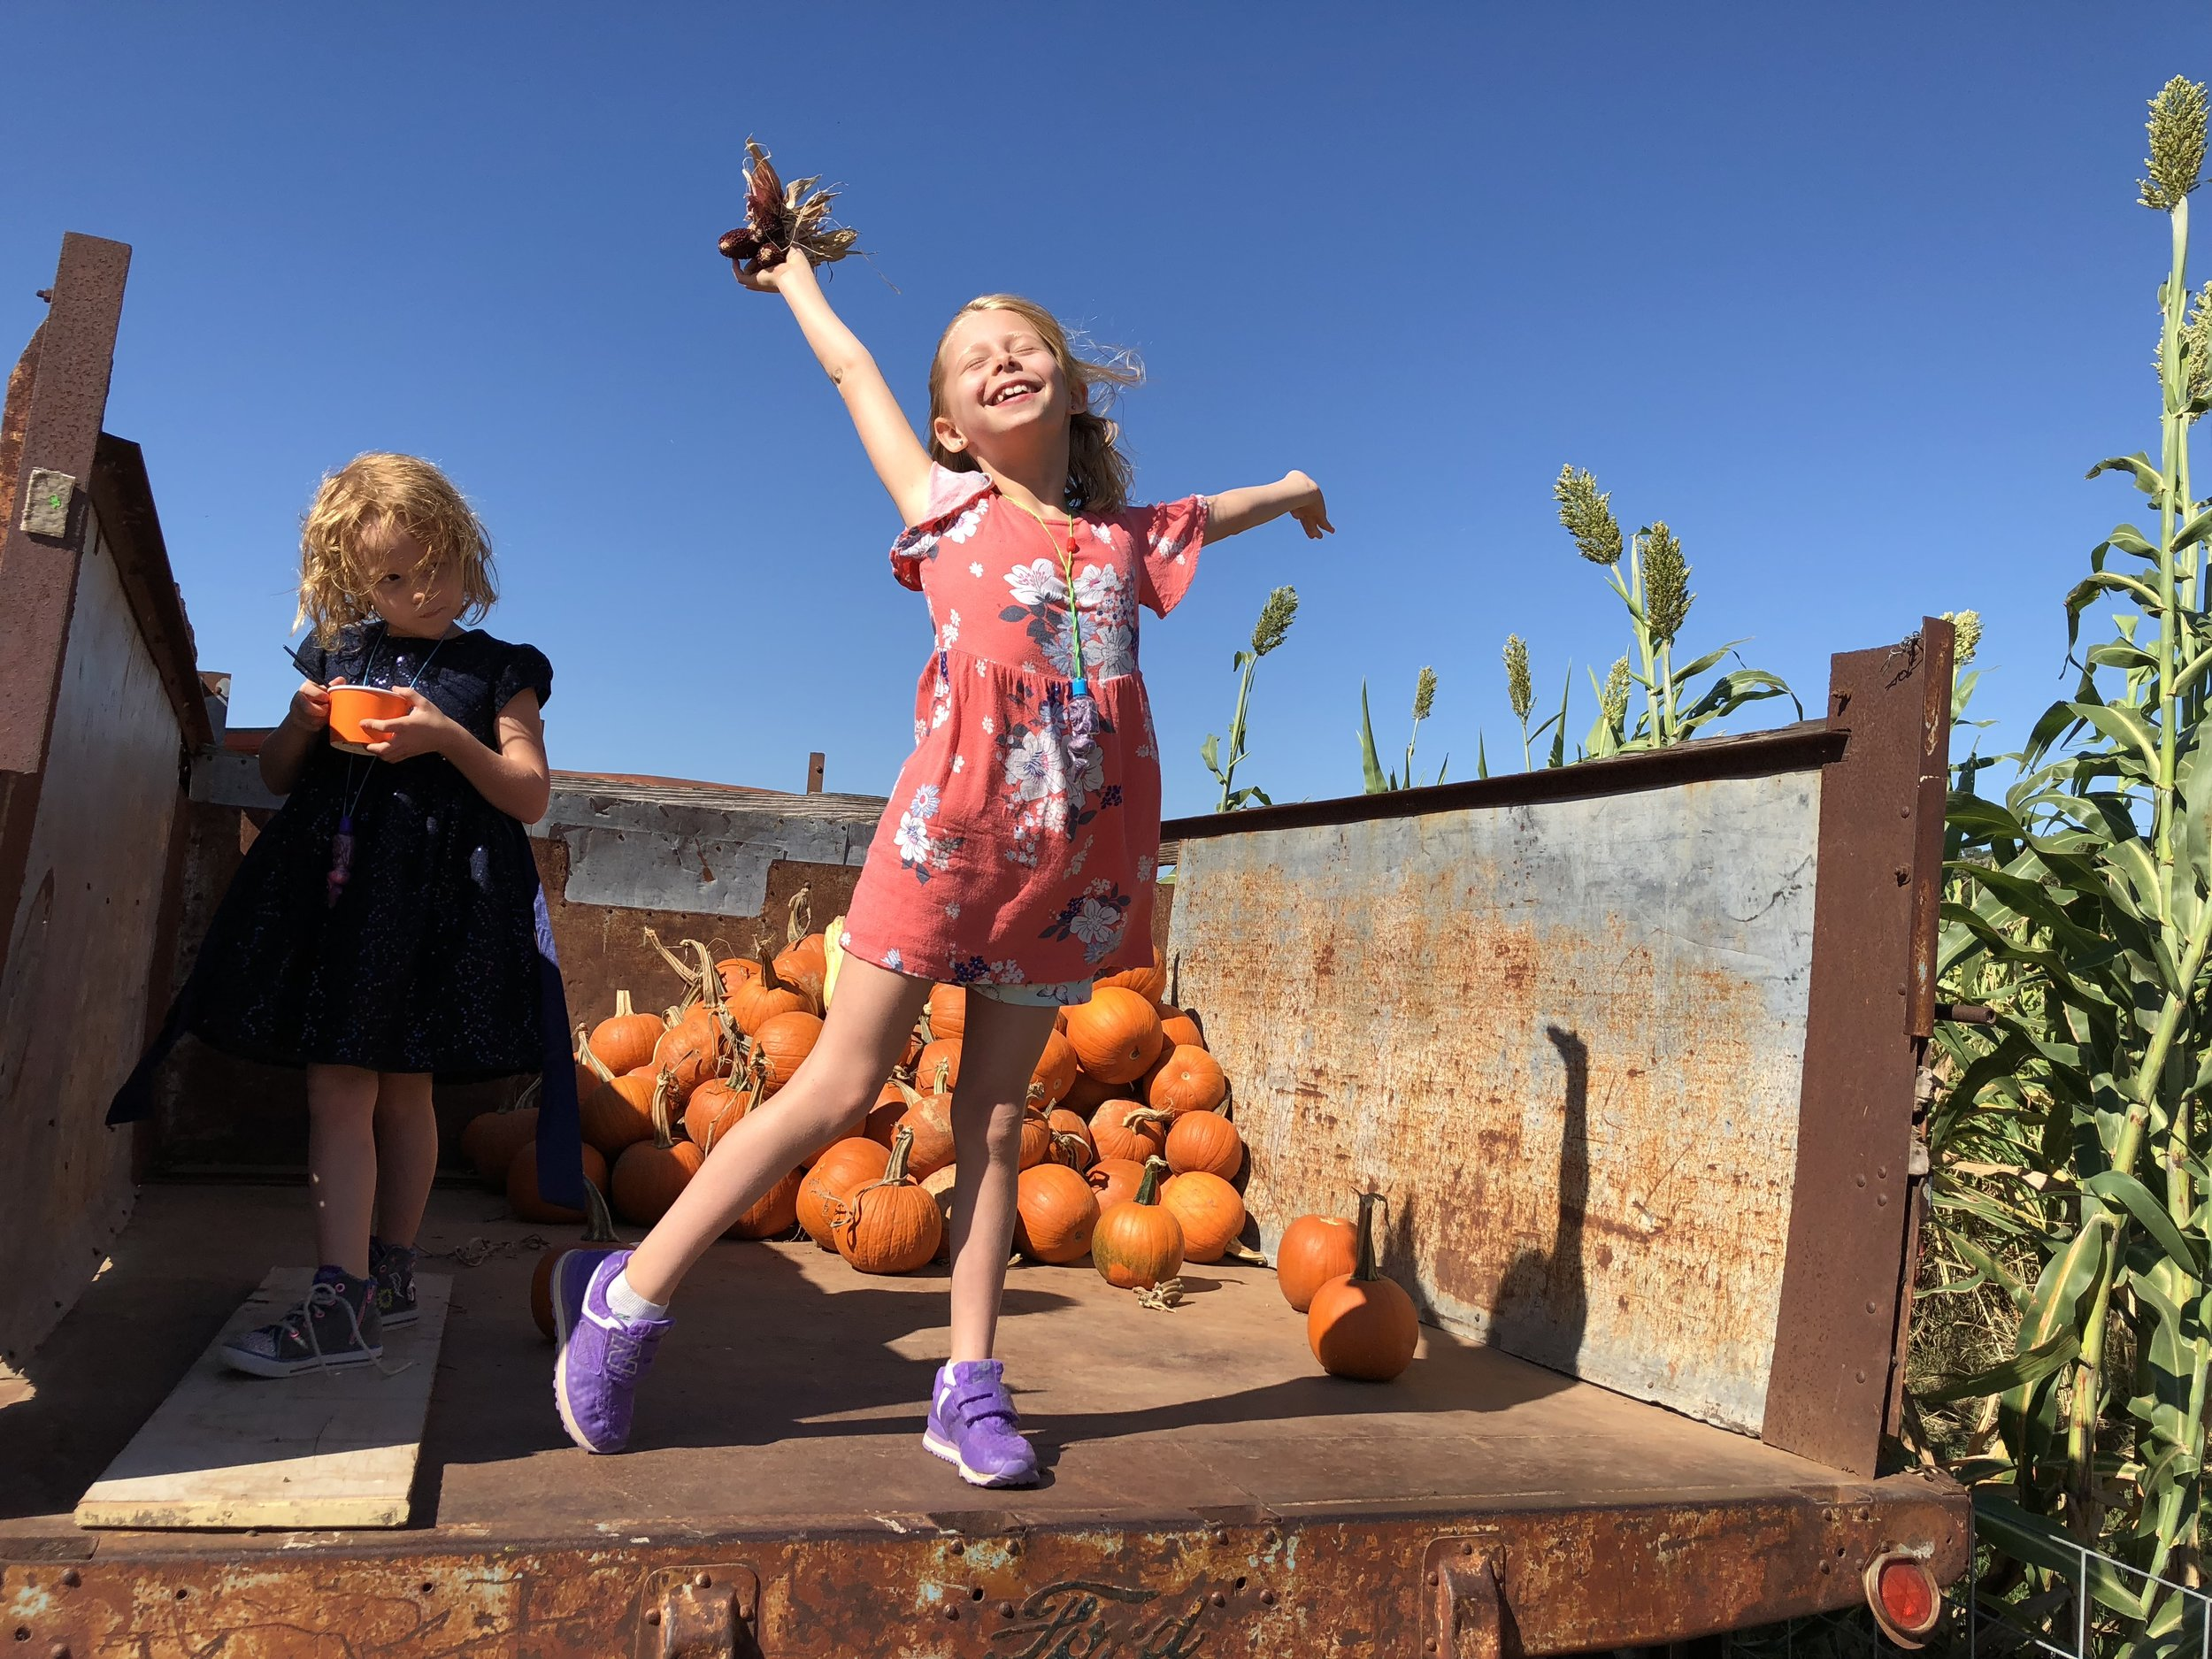 Relishing Fall, Sweet Berry Farms Visit